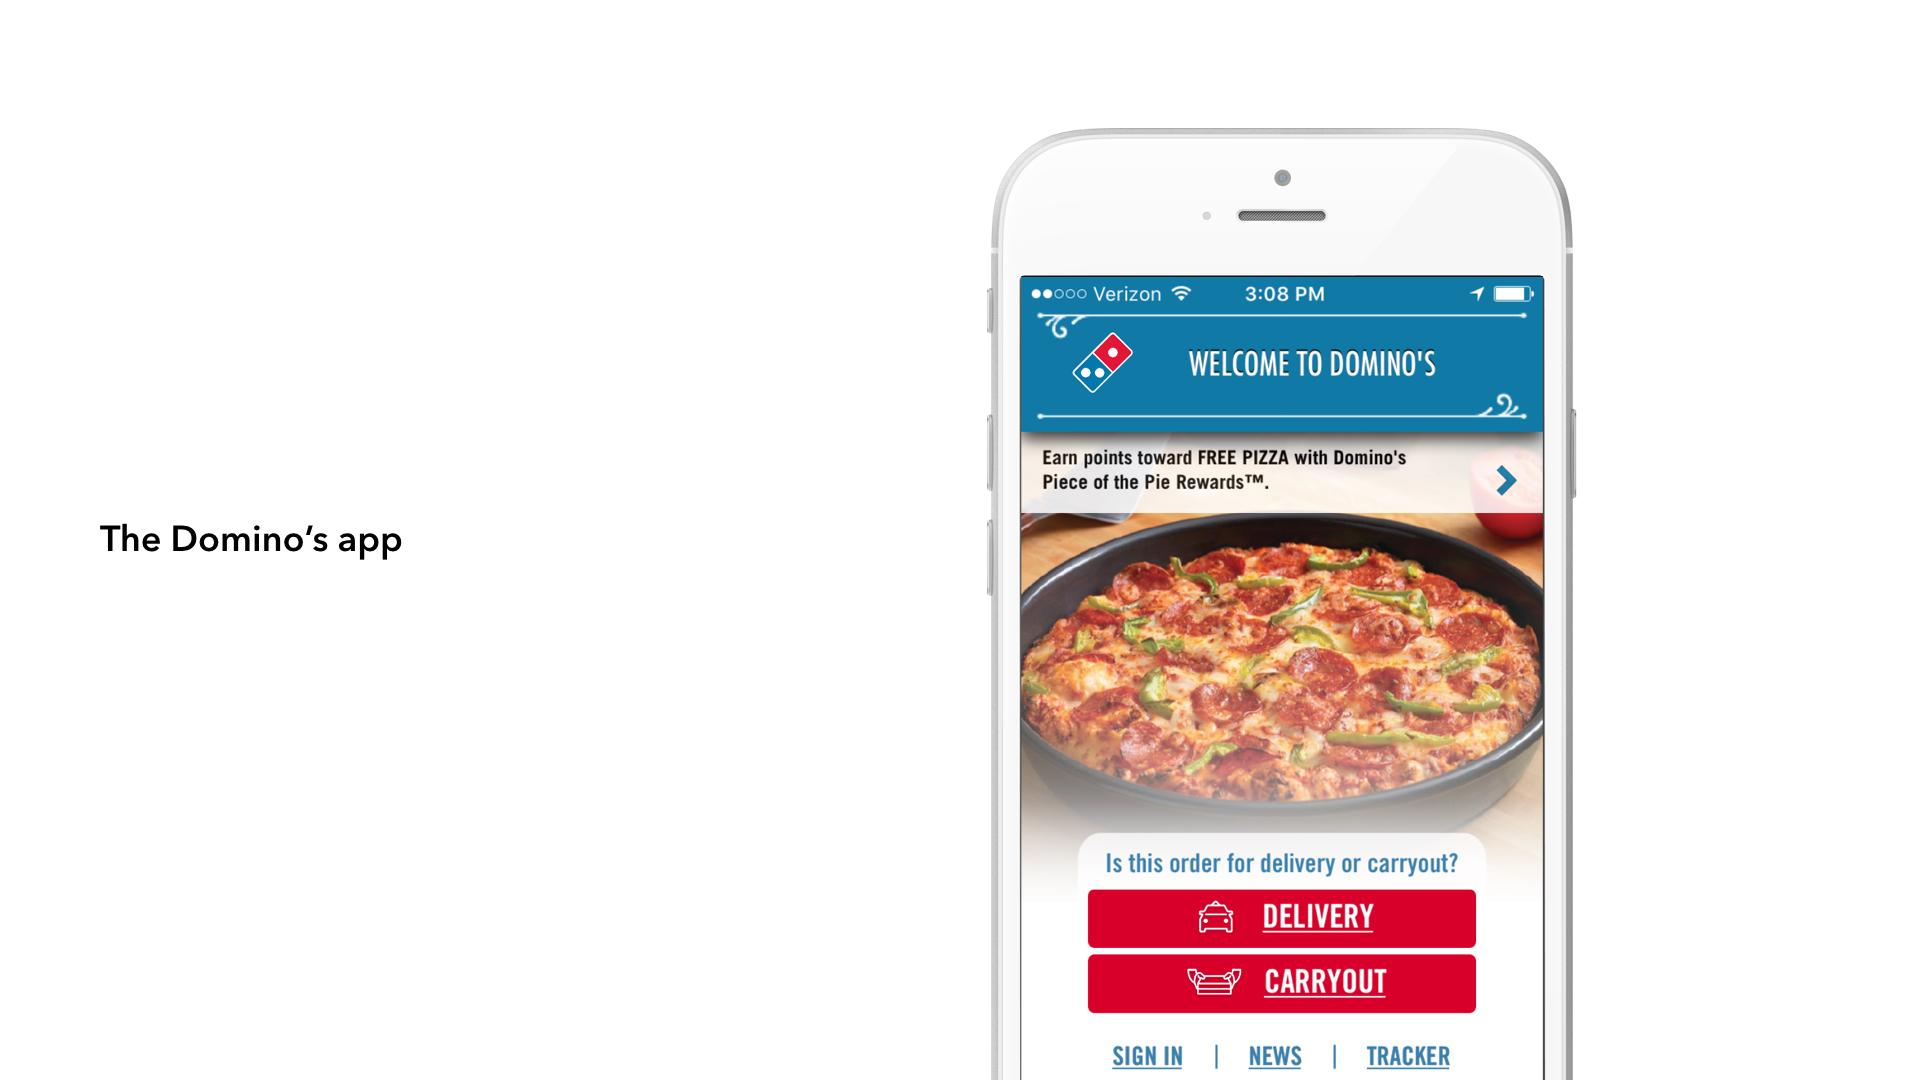 The Domino's app